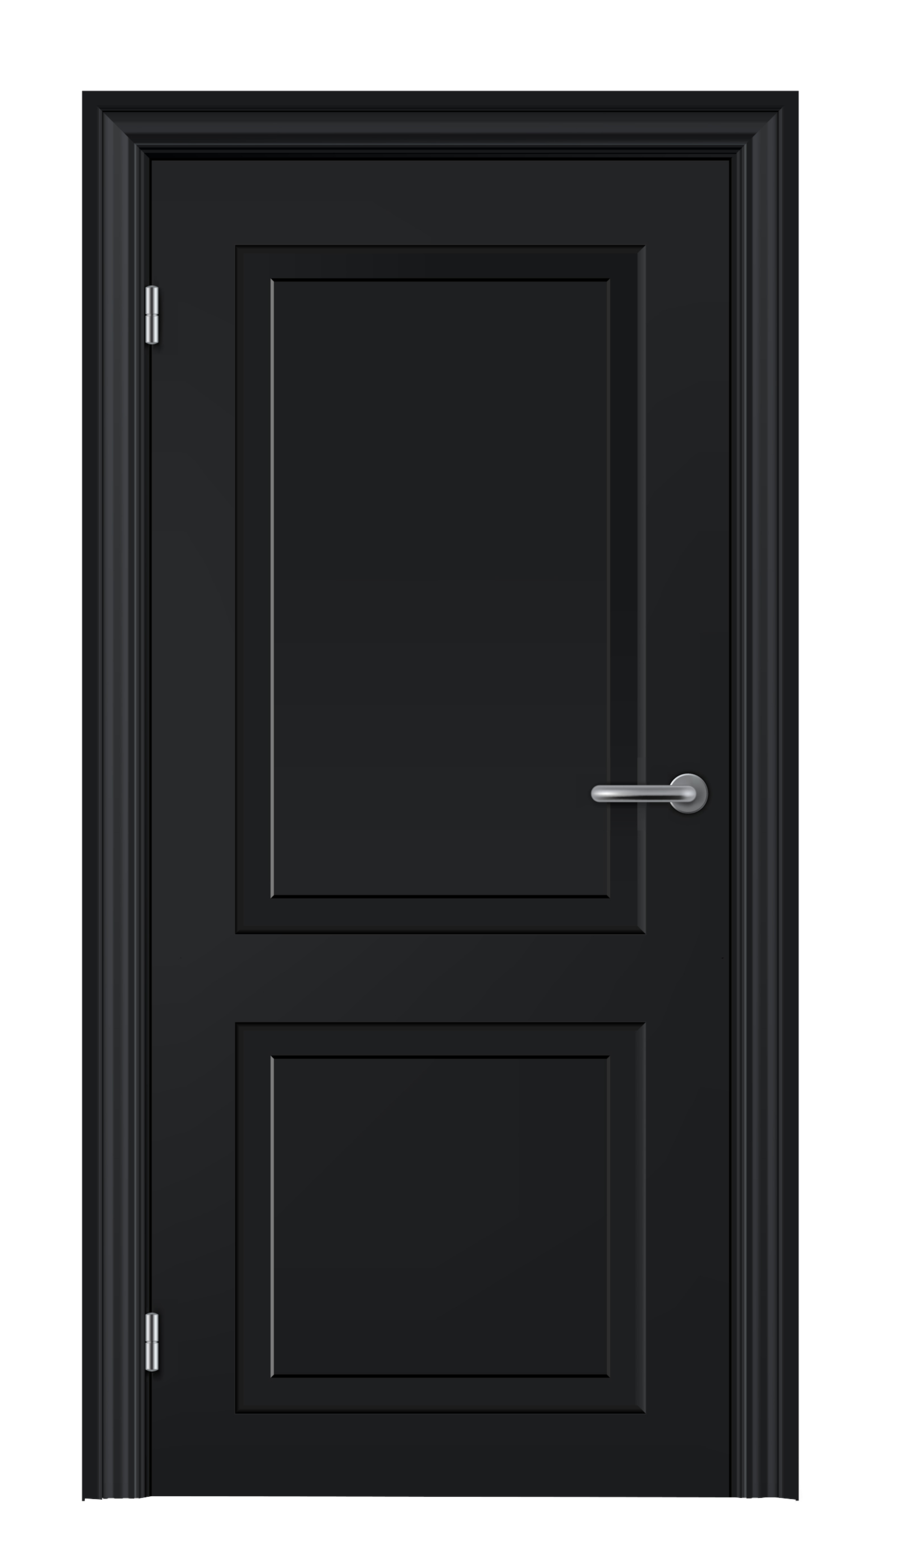 clip art transparent library Hd png images pluspng. Door transparent